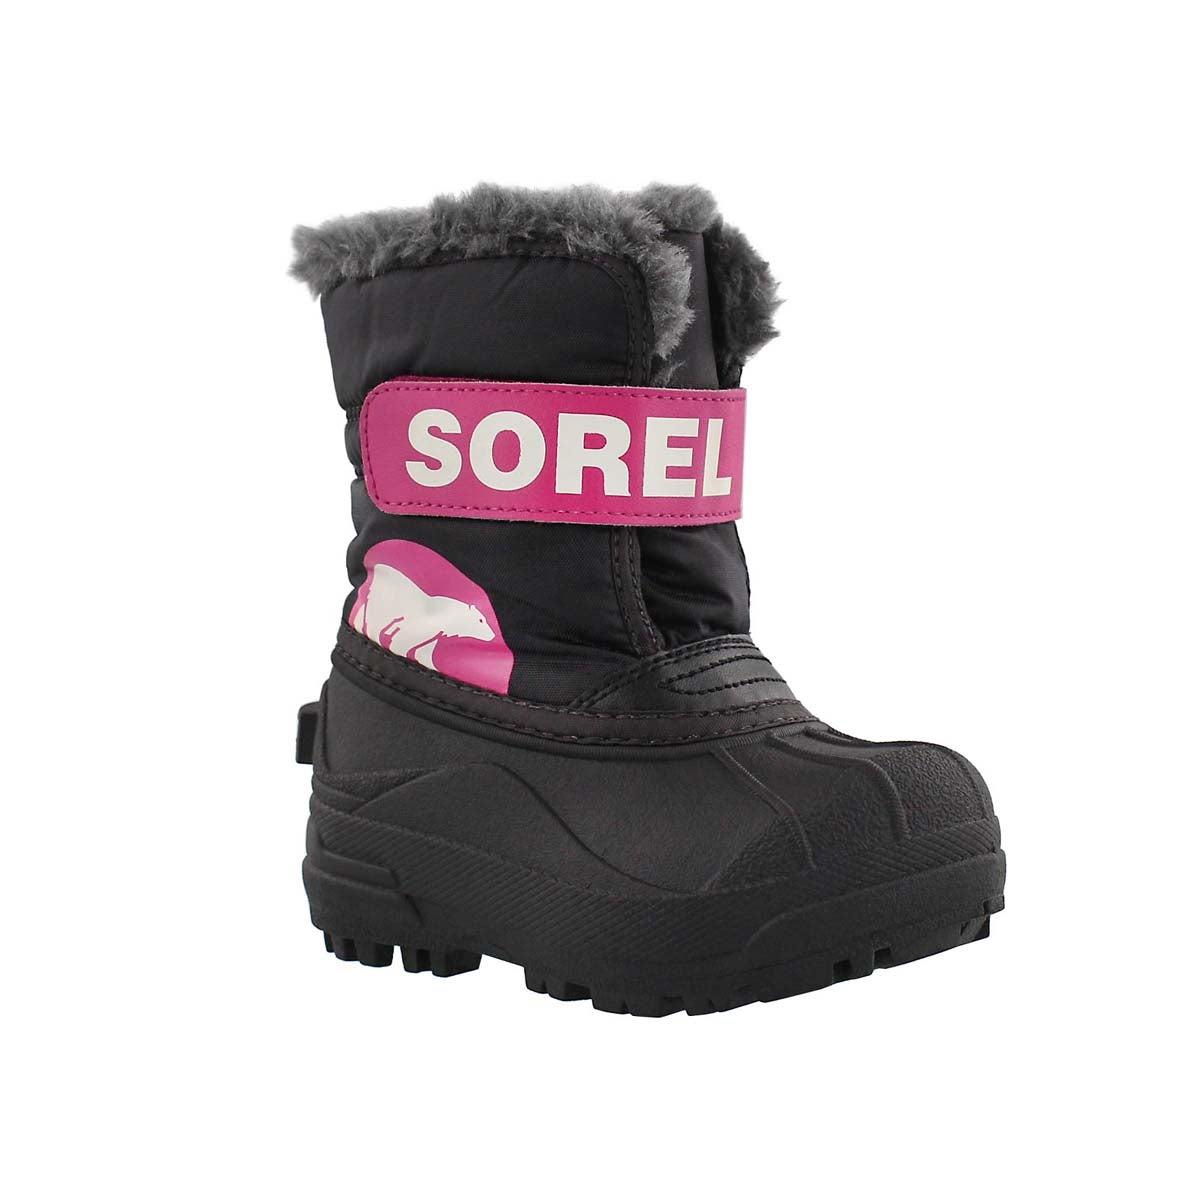 Infants' SNOW COMMANDER black/pink boots